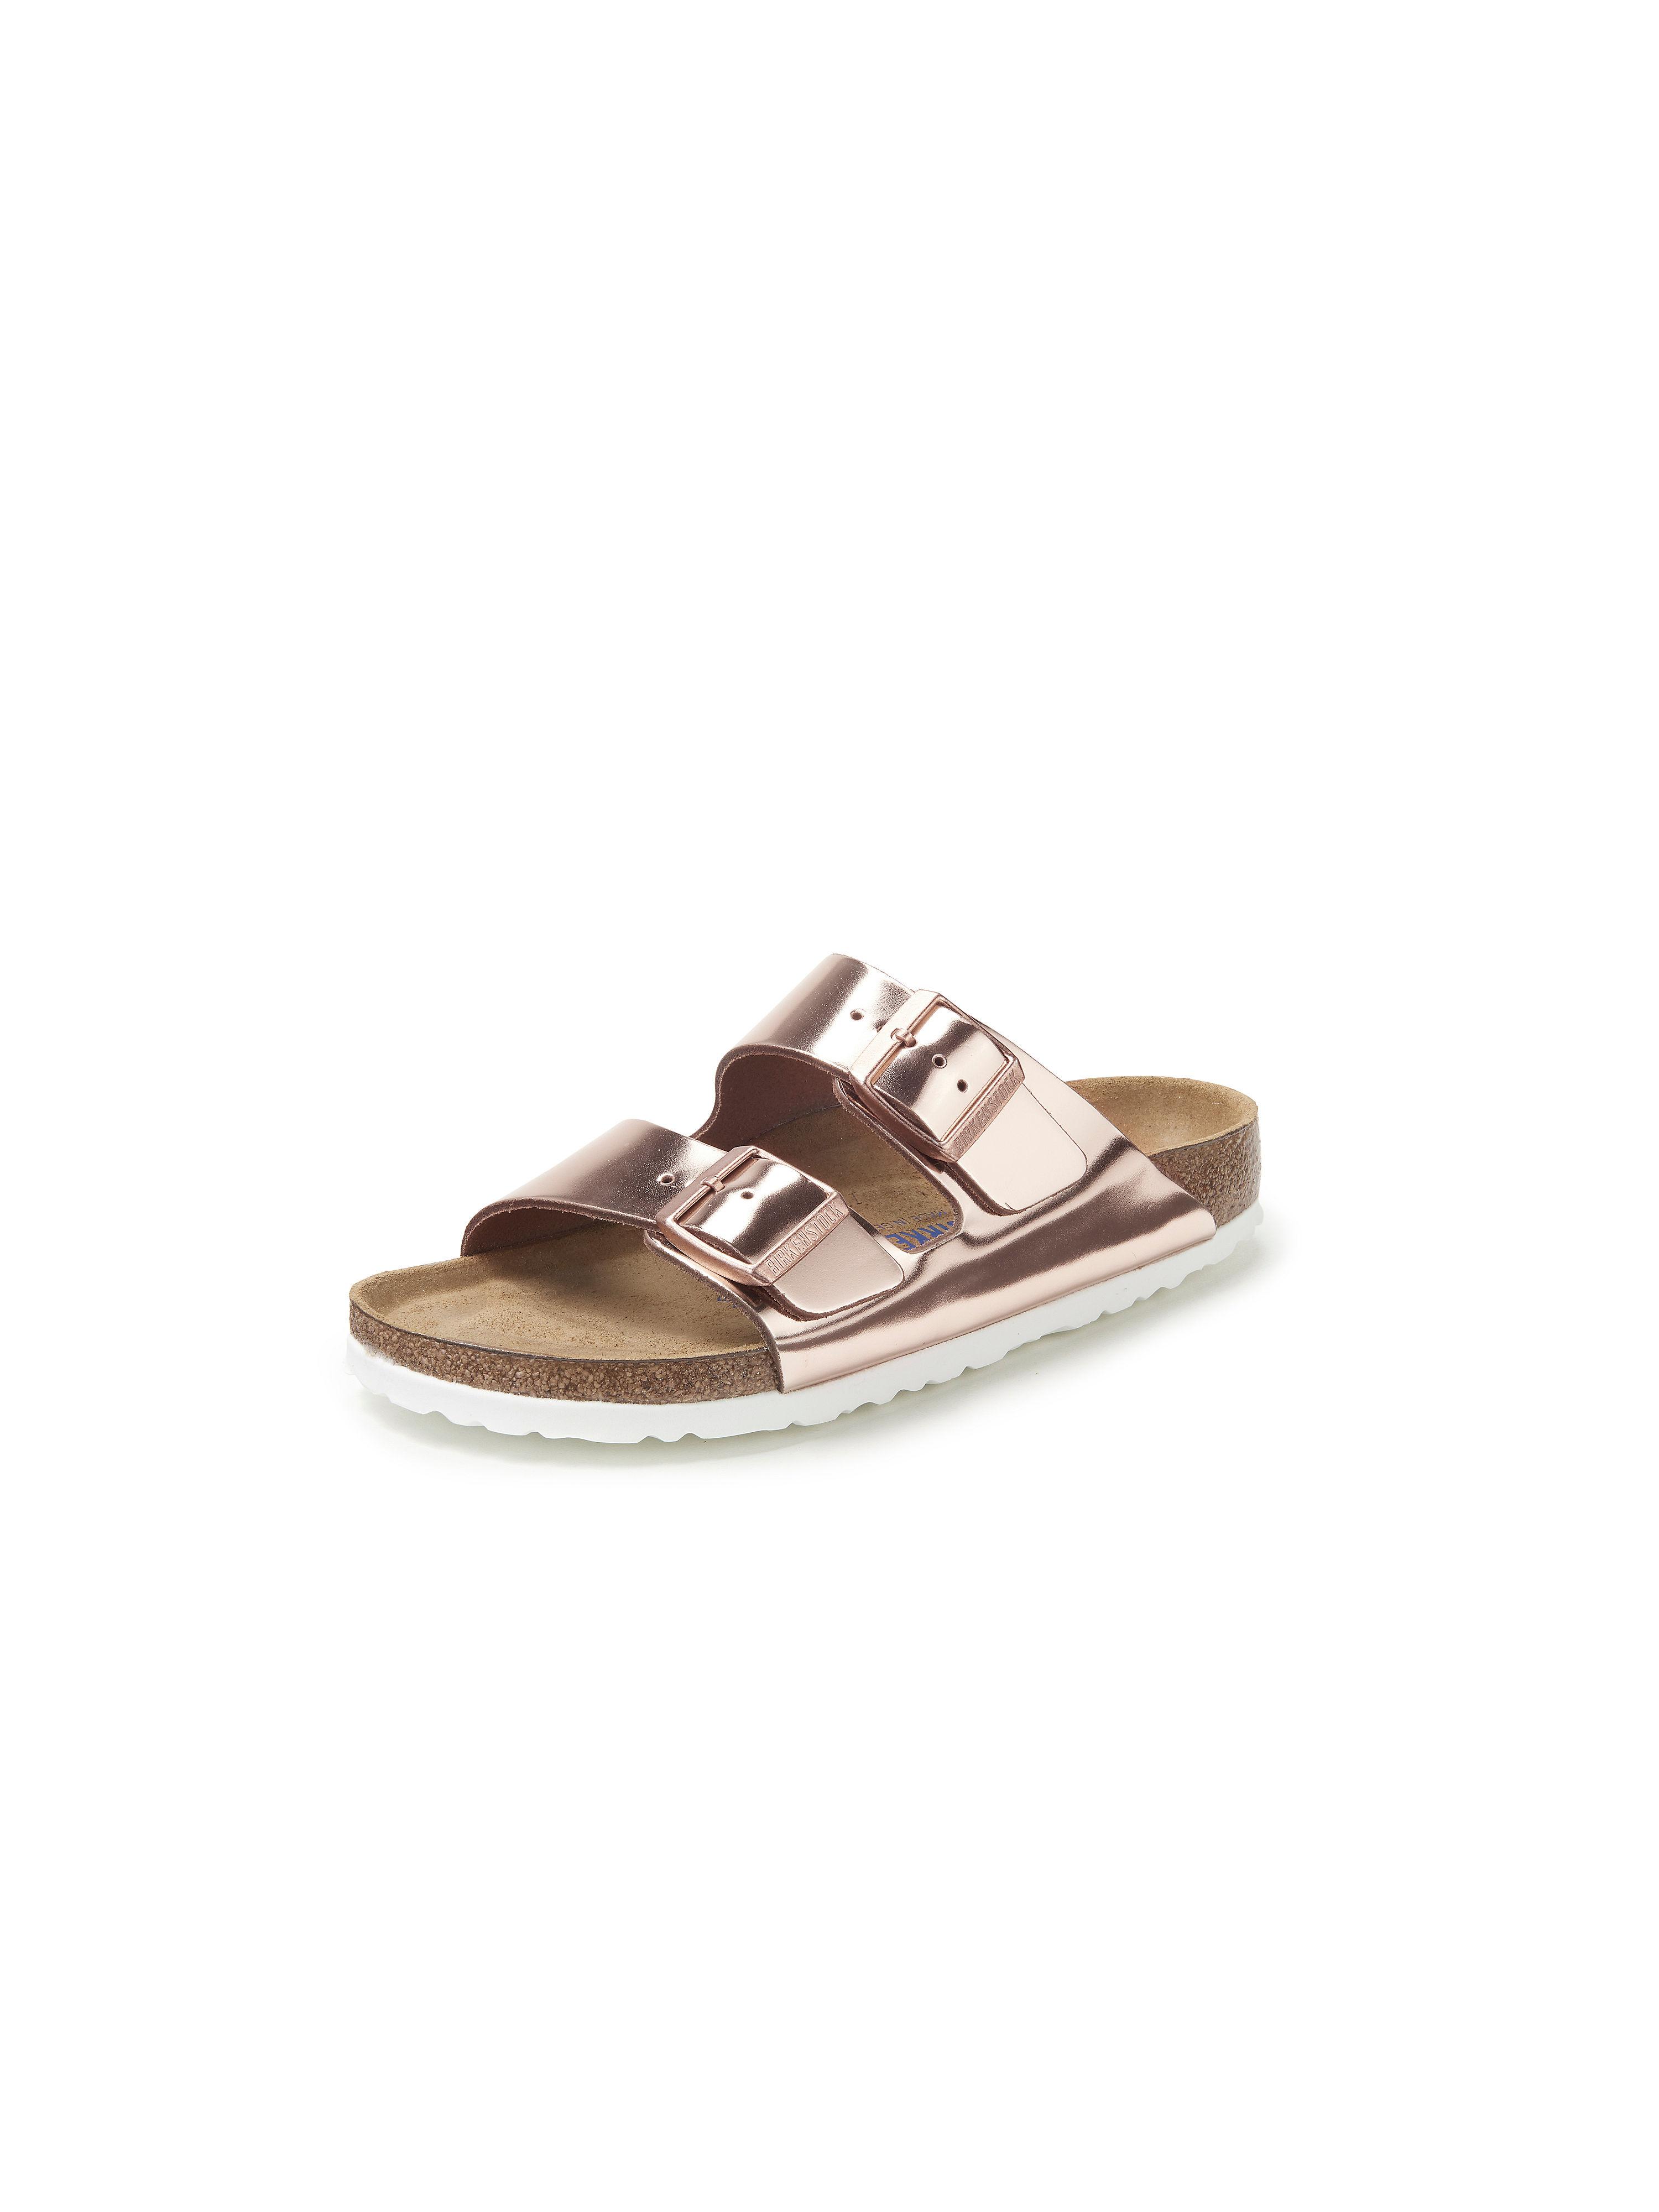 Les sandales modèle Arizona  Birkenstock rose taille 43